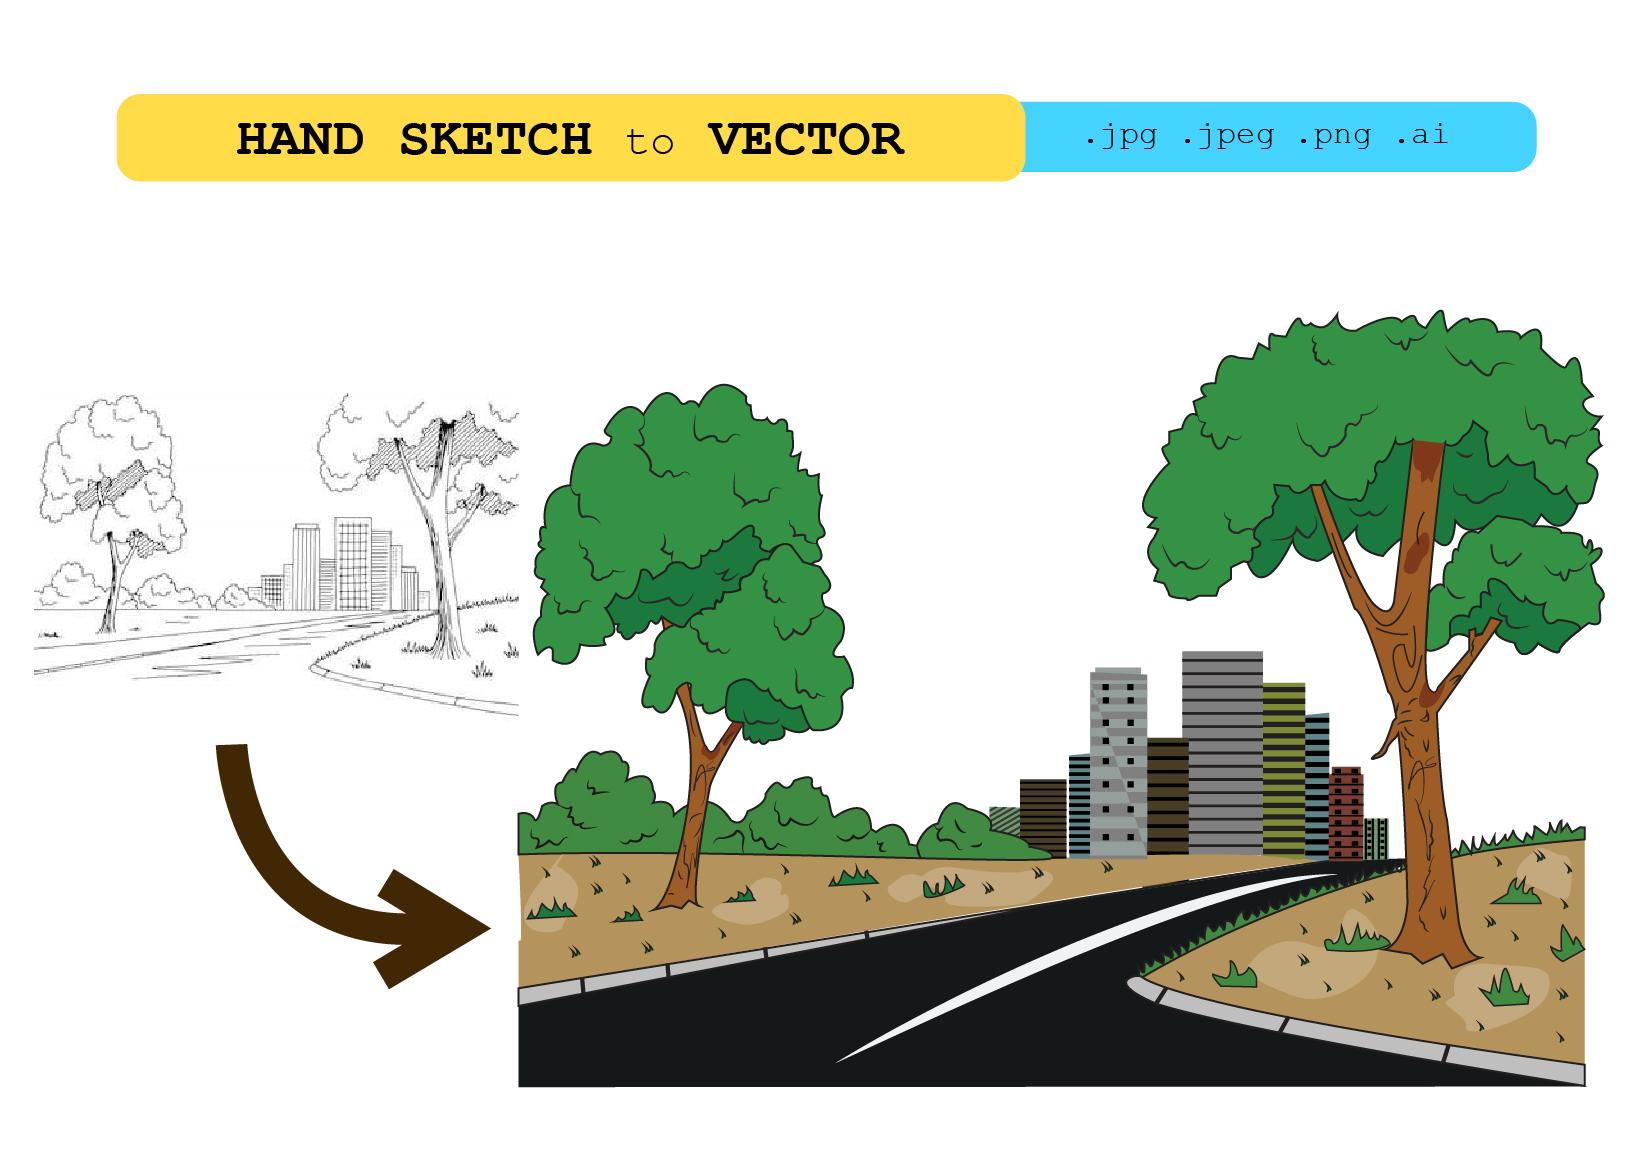 I will do sketch, logo idea to vector conversion professionally